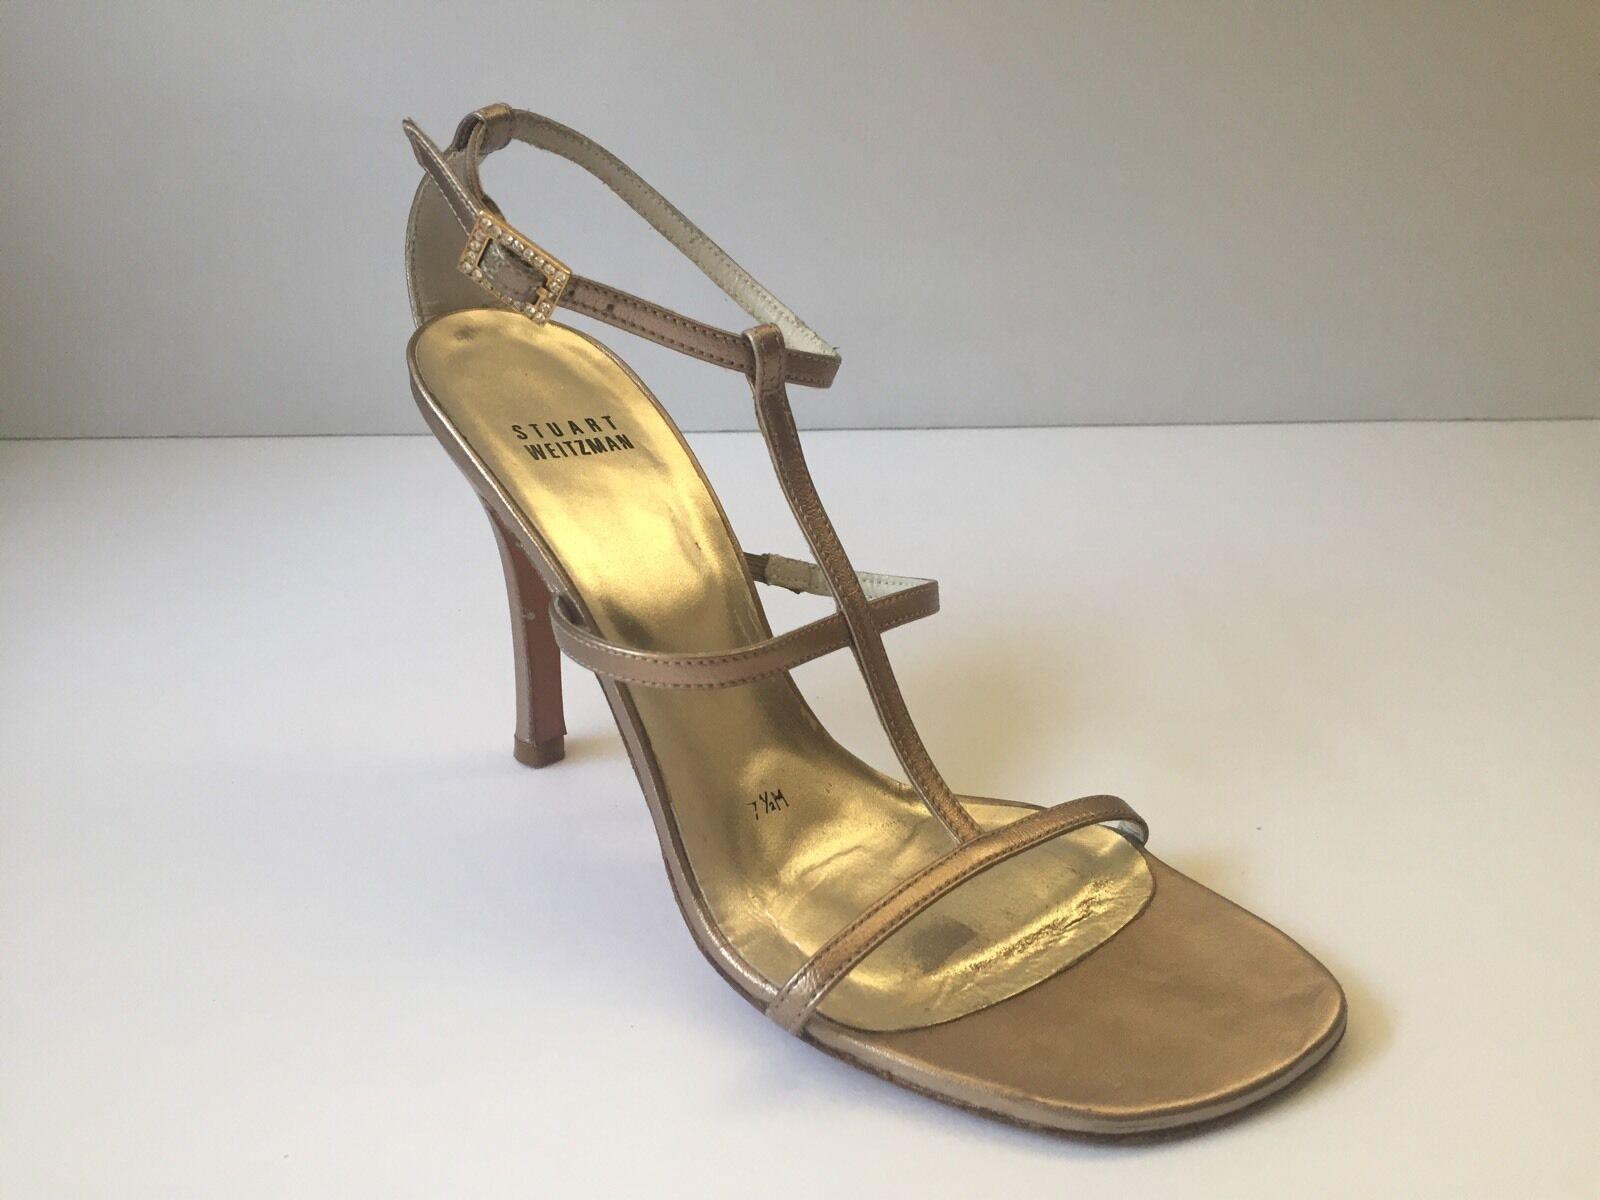 Stuart Weizman gold strappy heels Stilettos size 7 1 2